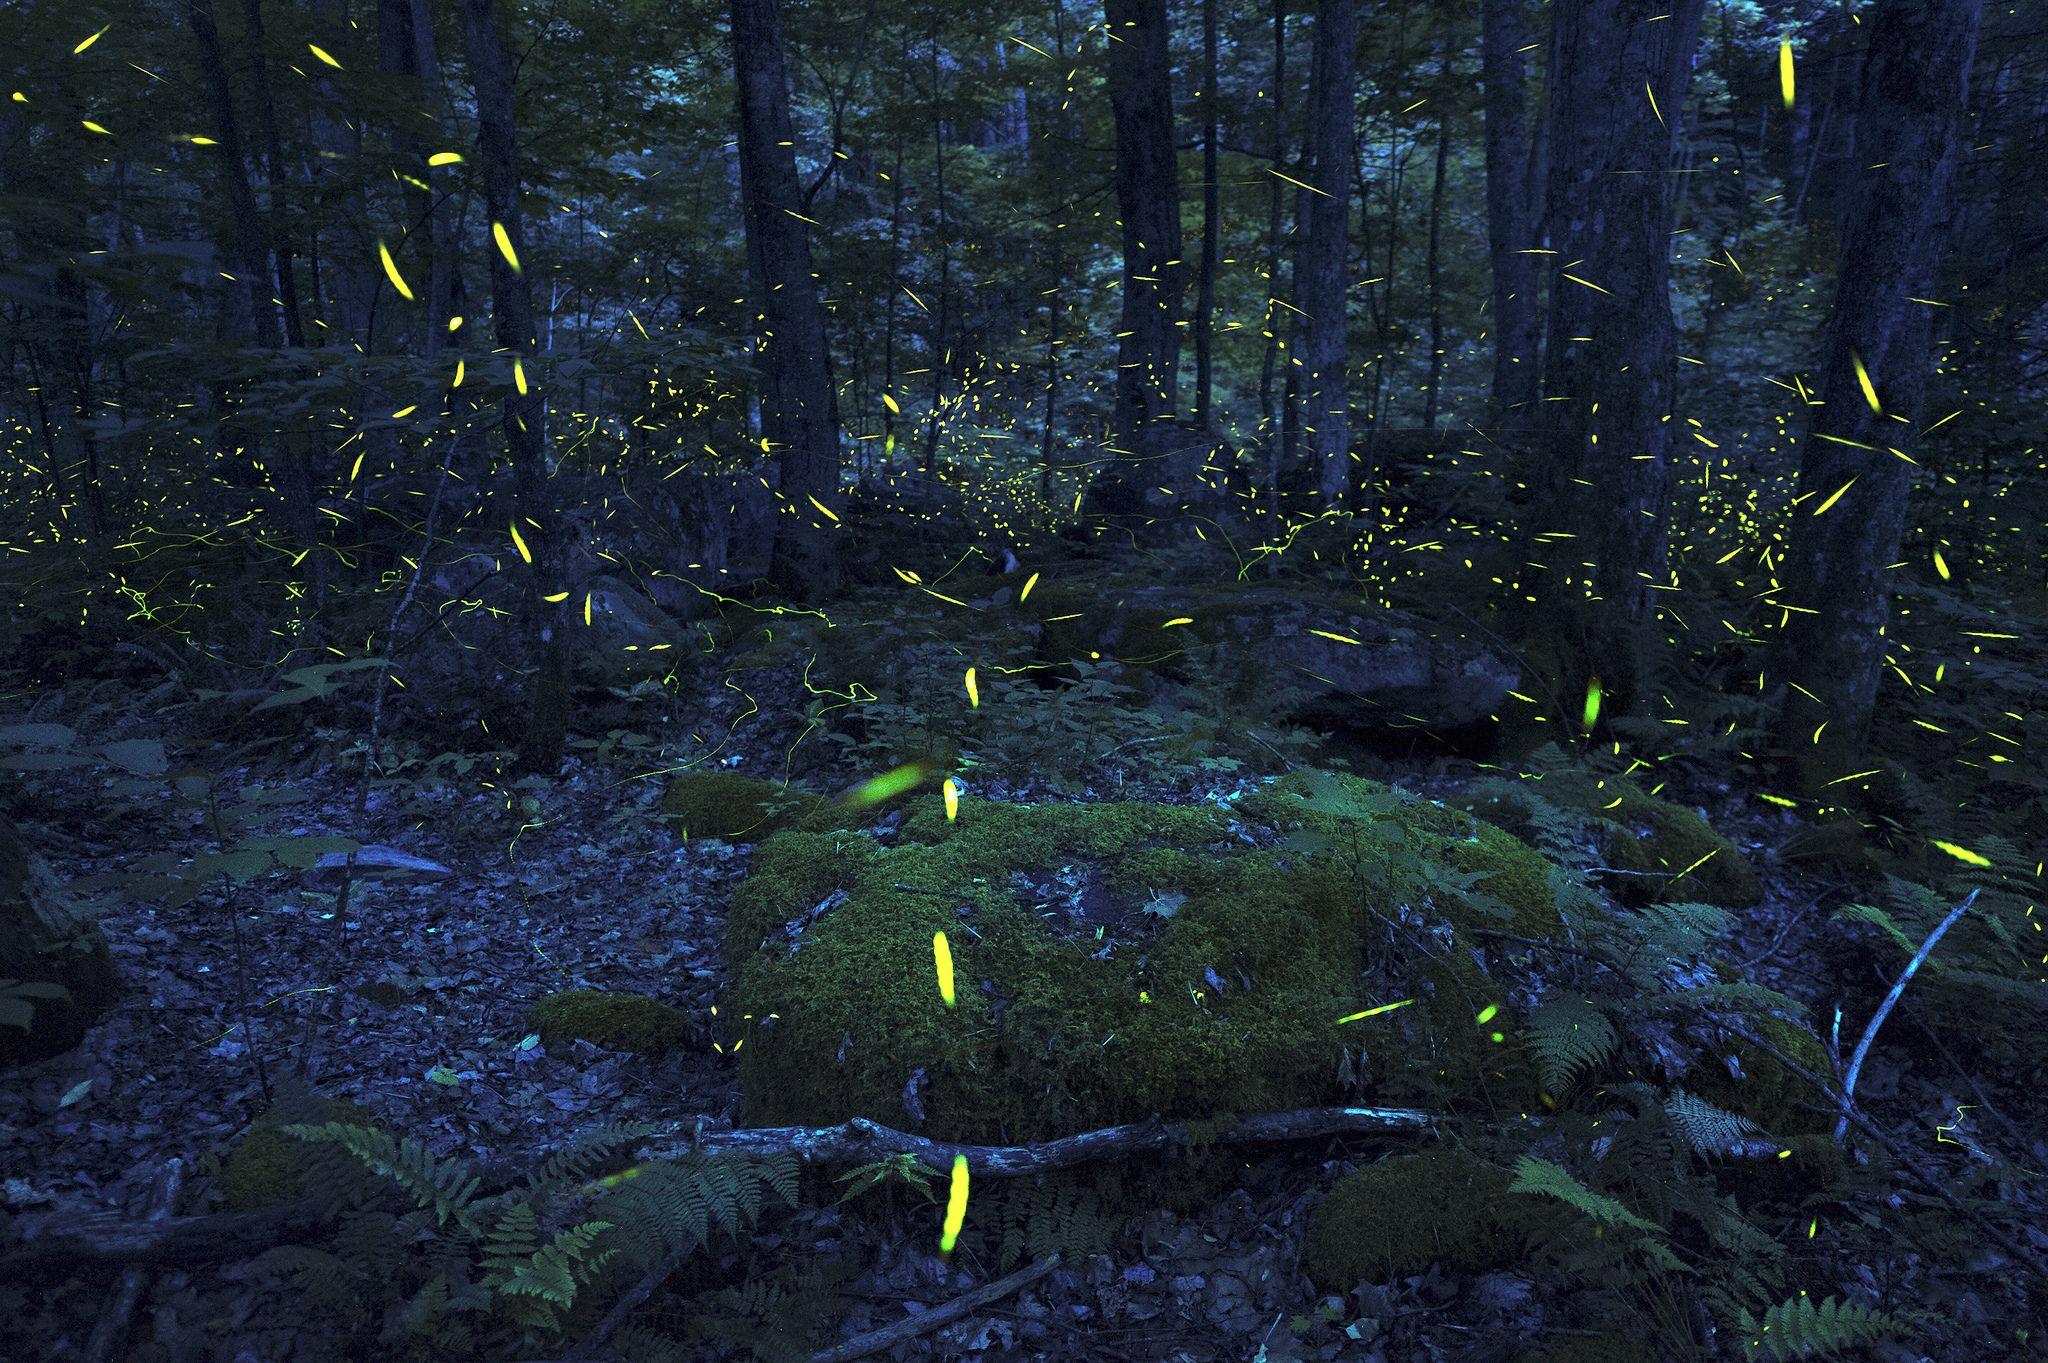 https://flic.kr/p/nNf8dd   Synchronous Fireflies of Elkmont